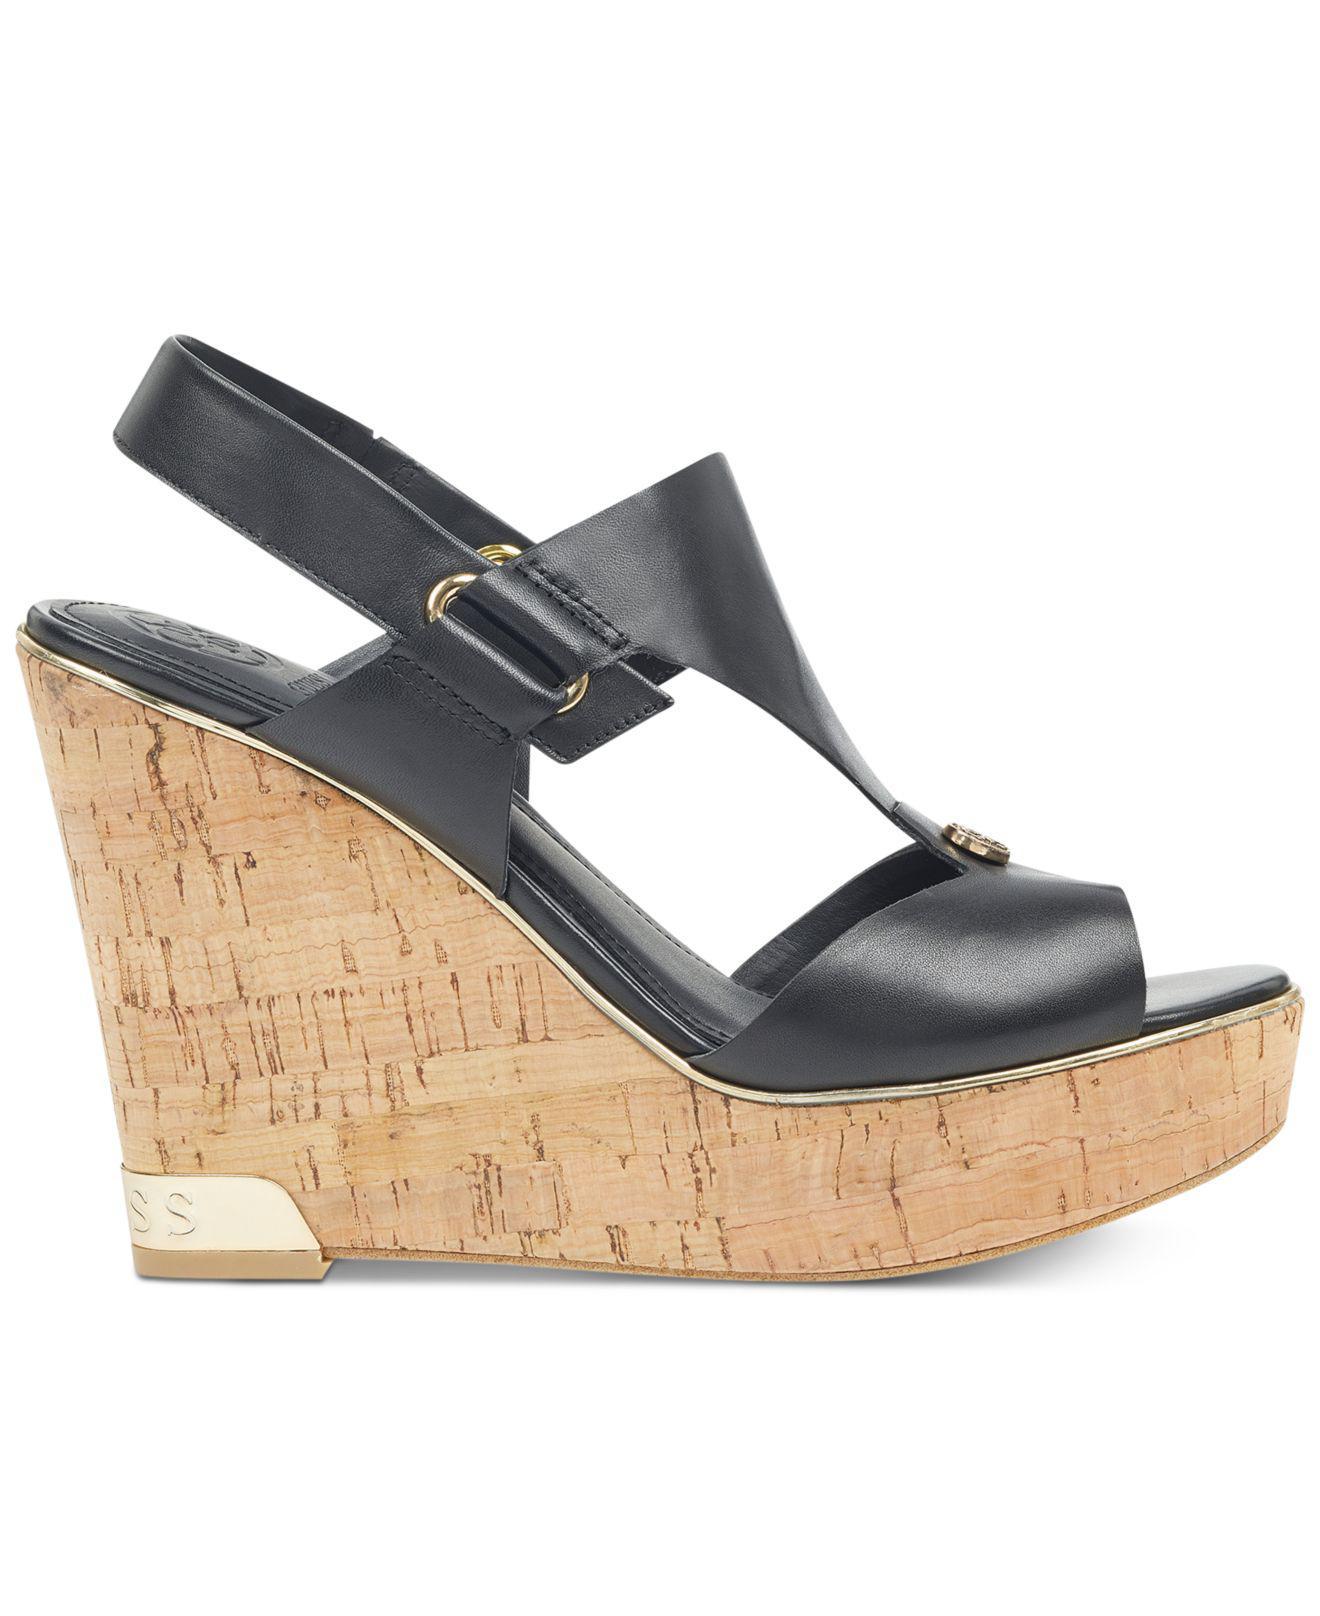 447bce82f9 Guess Hulda Platform Wedge Sandals in Black - Lyst